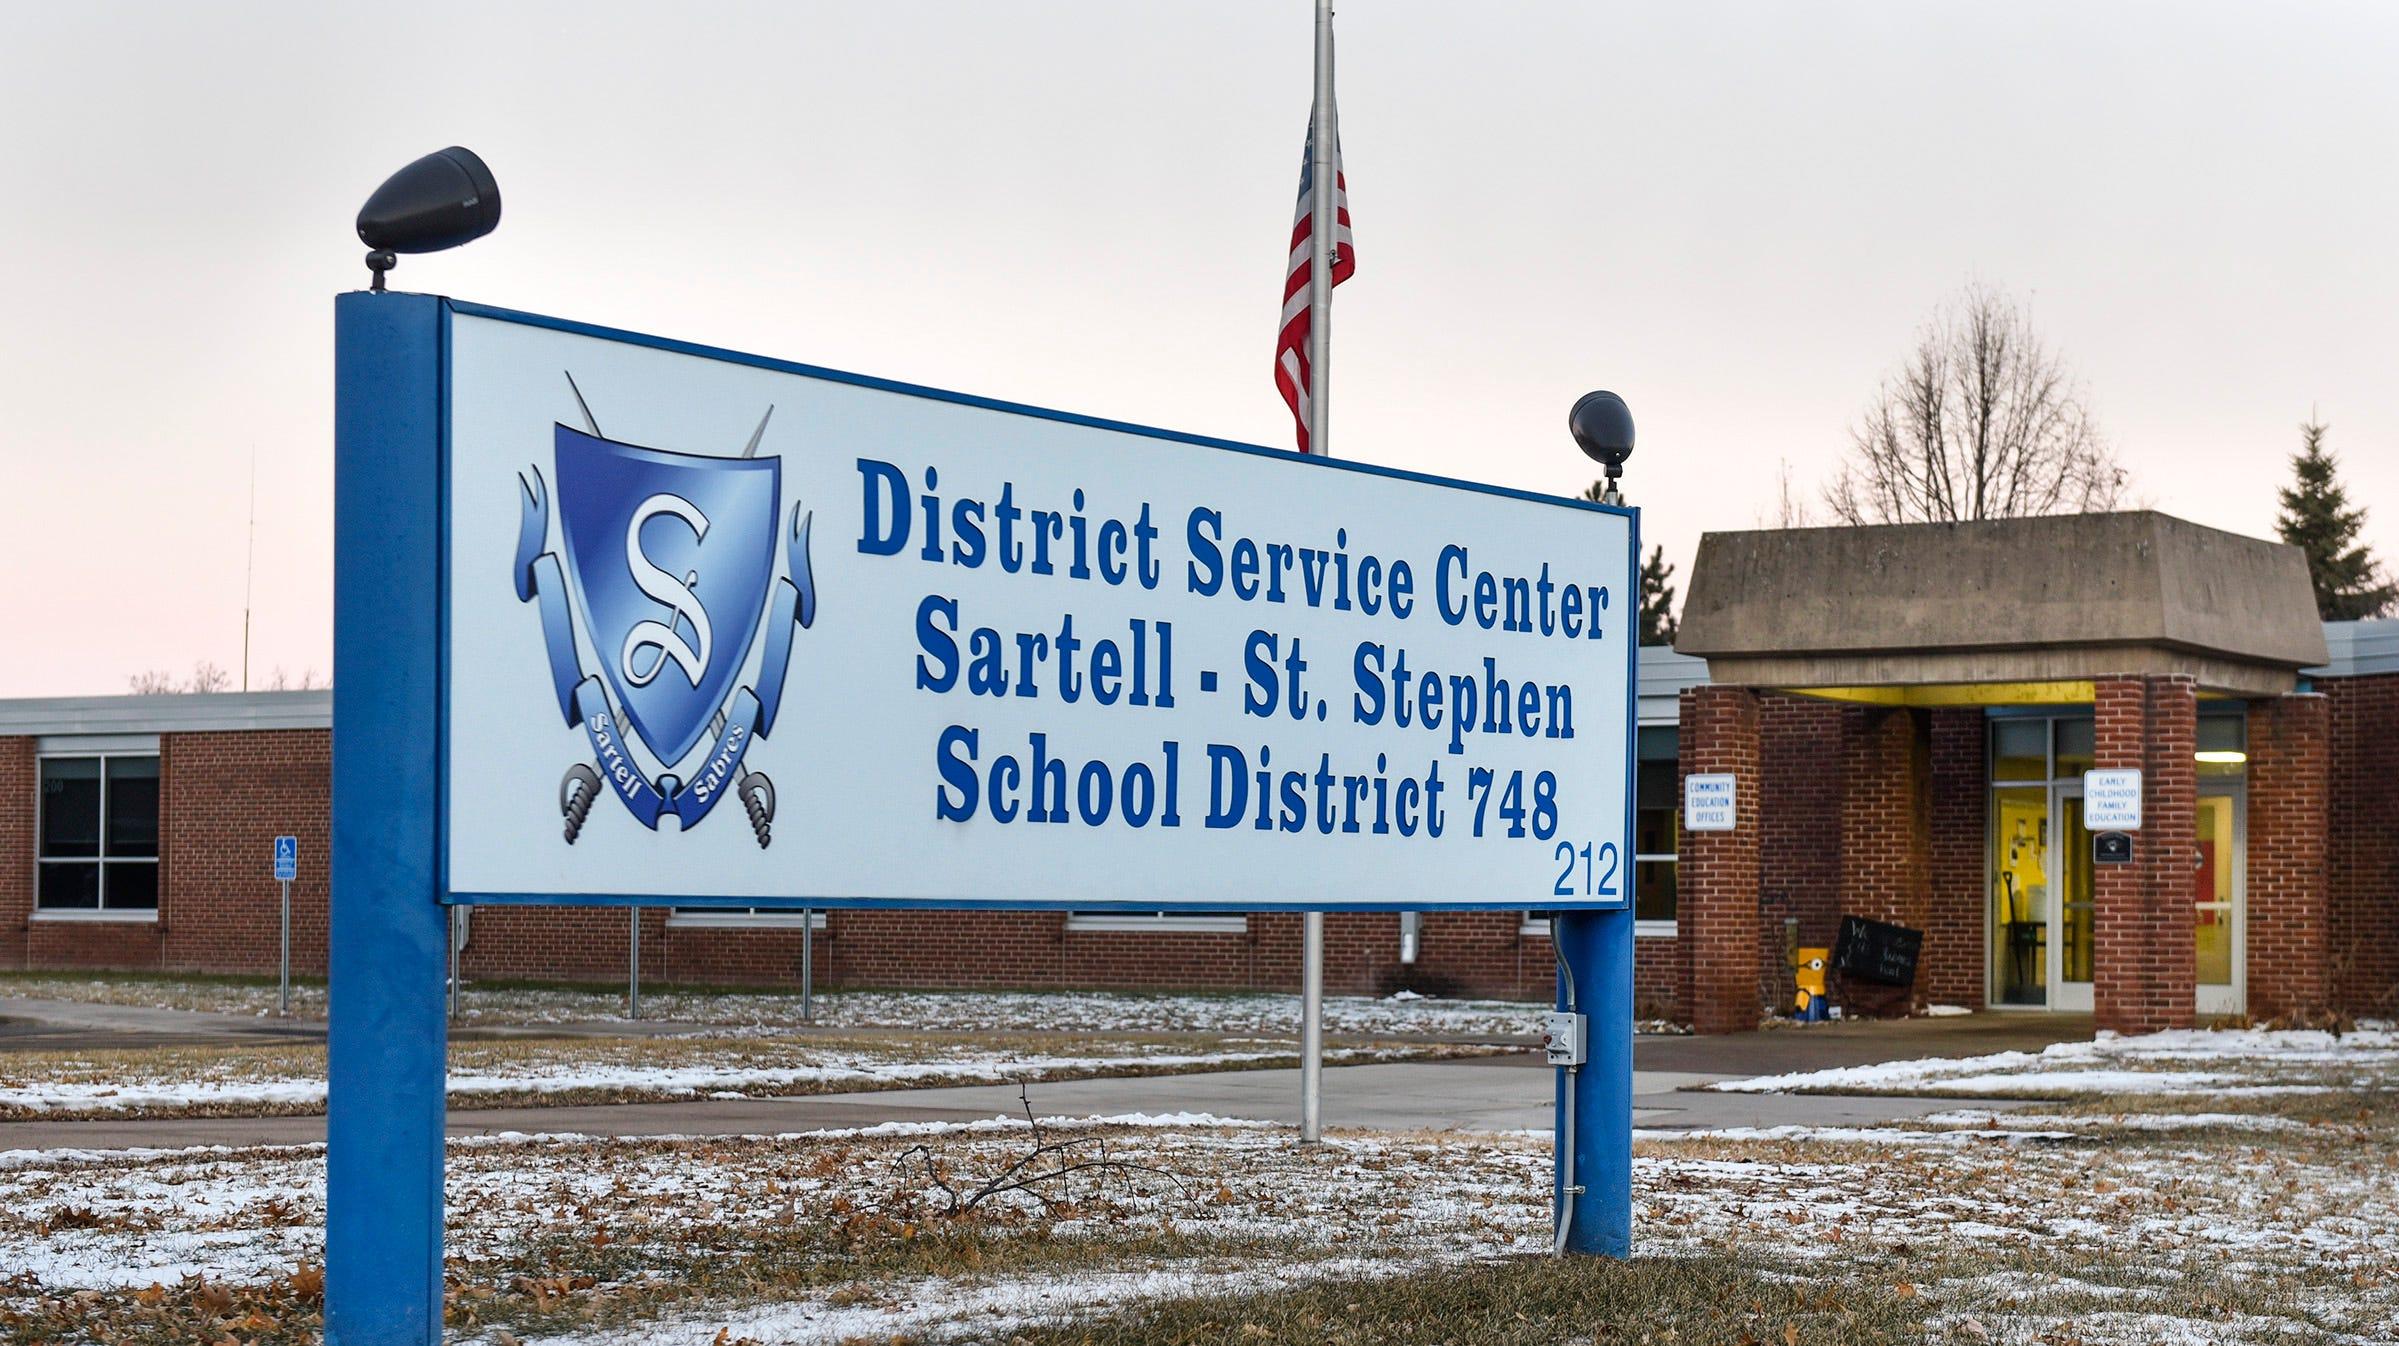 The Sartell-St. Stephen School District Service Center shown Thursday, Dec. 13, in Sartell.